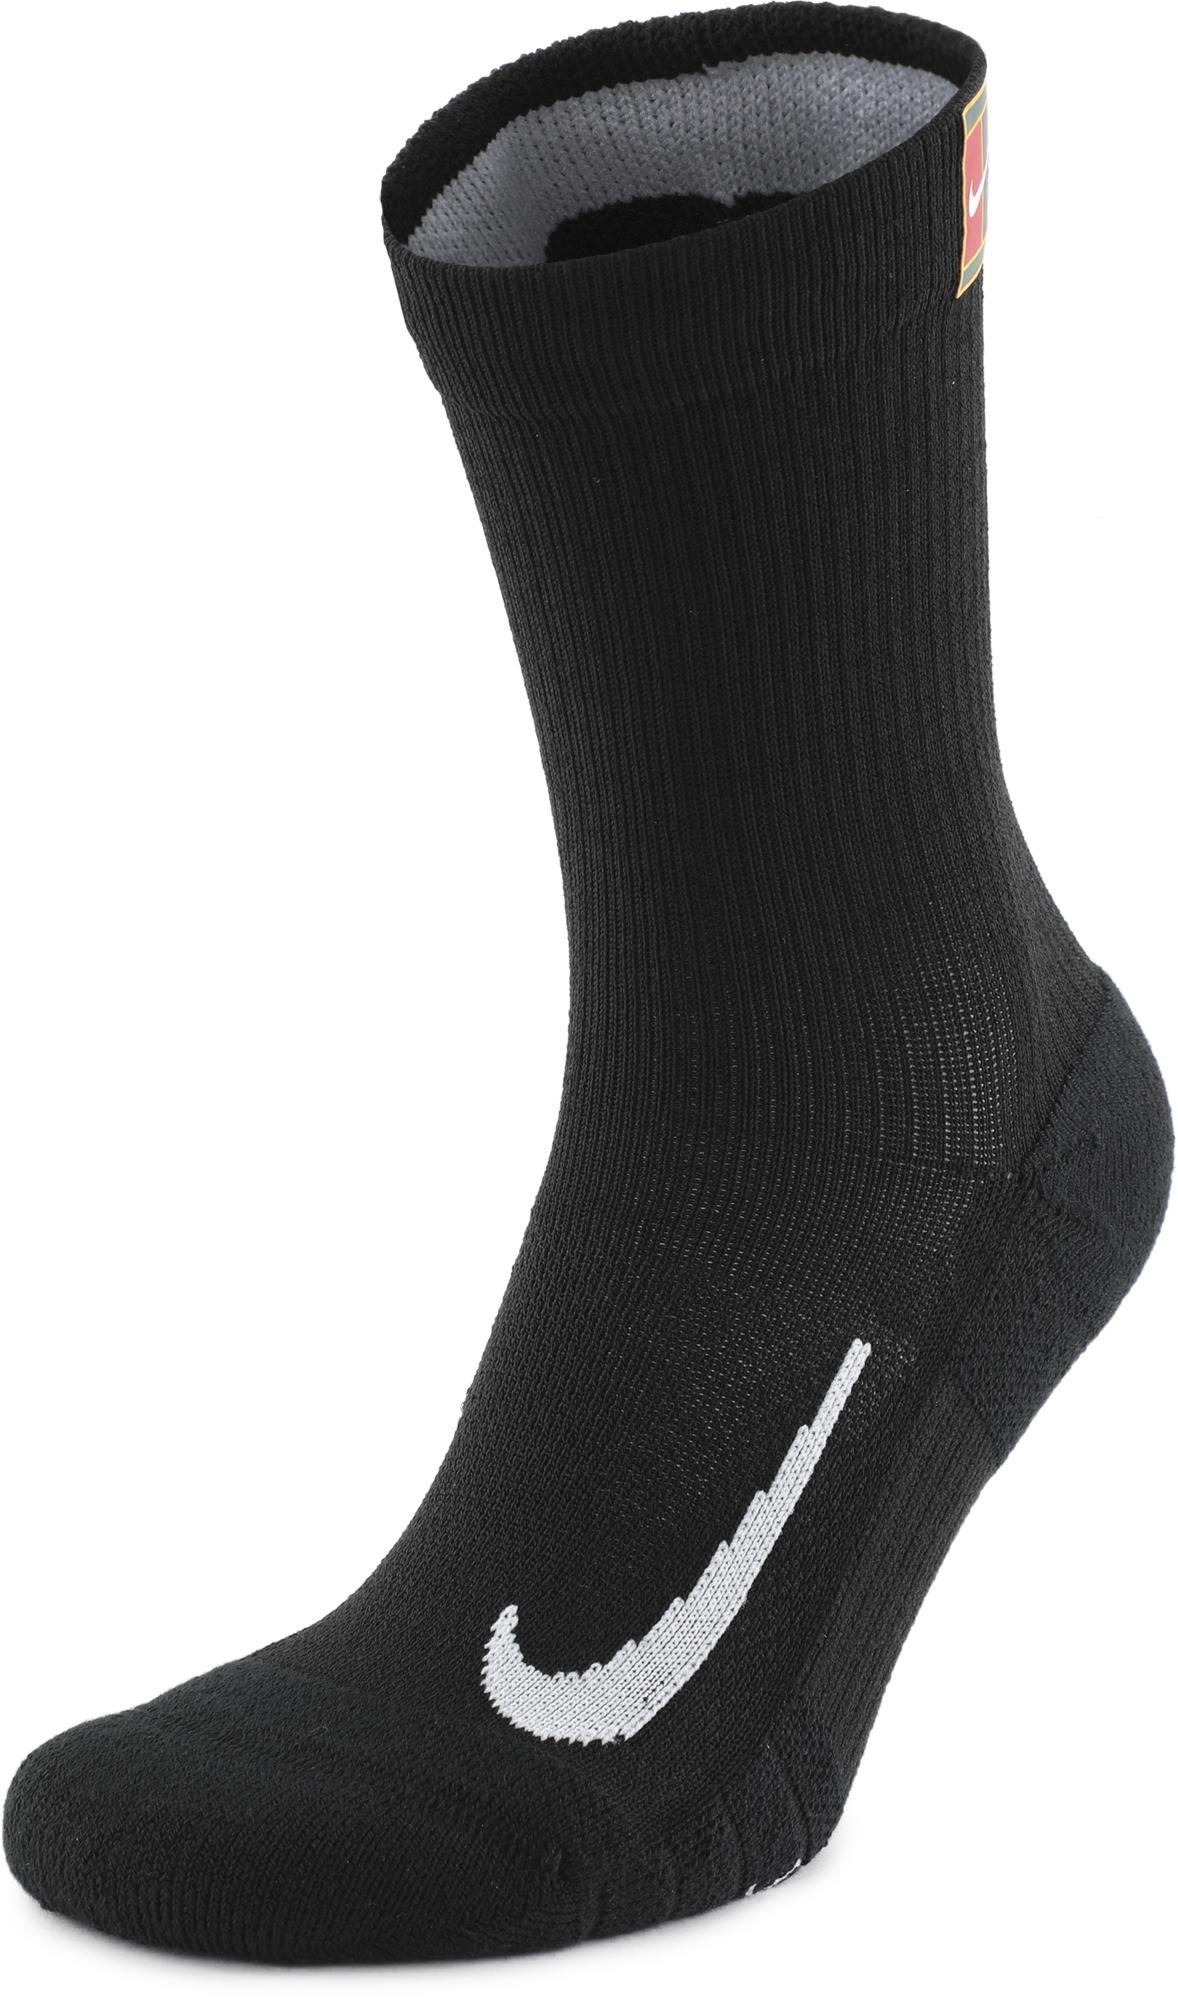 Носки Nike Court Multiplier Cushioned, 2 пары, размер 37-41 недорого